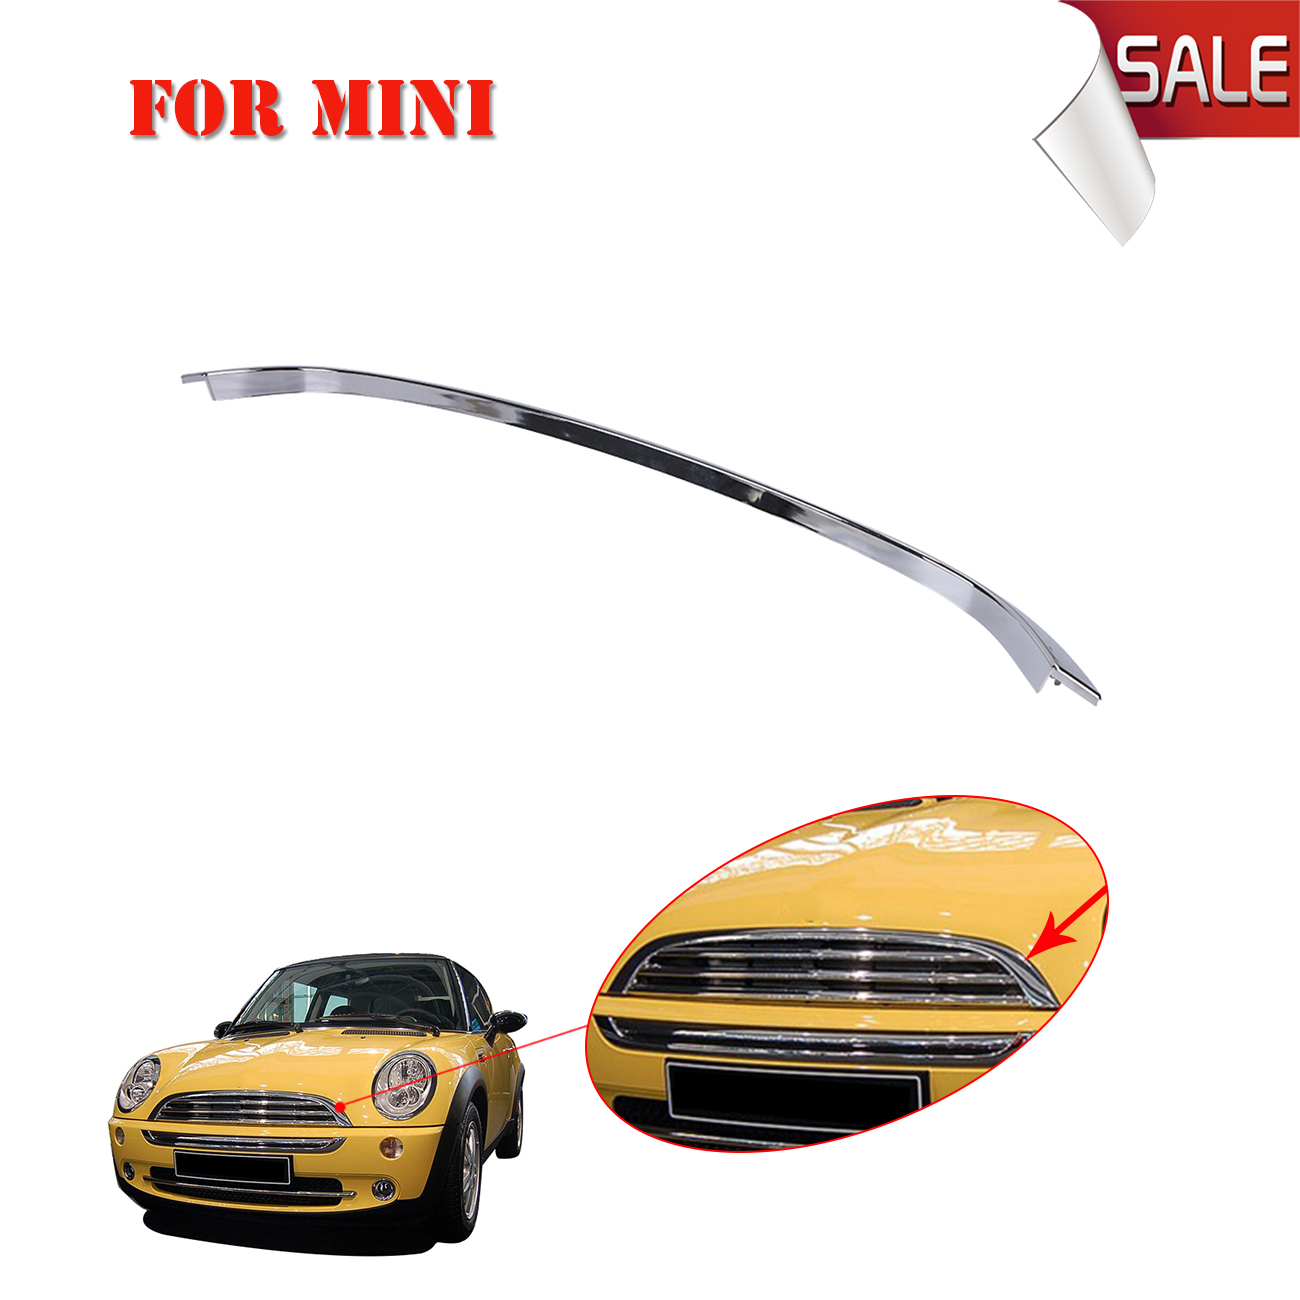 Chrome Front Bumper Hood Moulding Trim Frame Strip For Mini Cooper John / S / Clubman / JCW R55 R56 R57 OEM 51132751040 #W146 защита картера rival 333 8205 1 mini clubman 2015 v 1 5 mini clubman s 2015 v 2 0 mini cooper 2014 v 1 5 mini cooper s